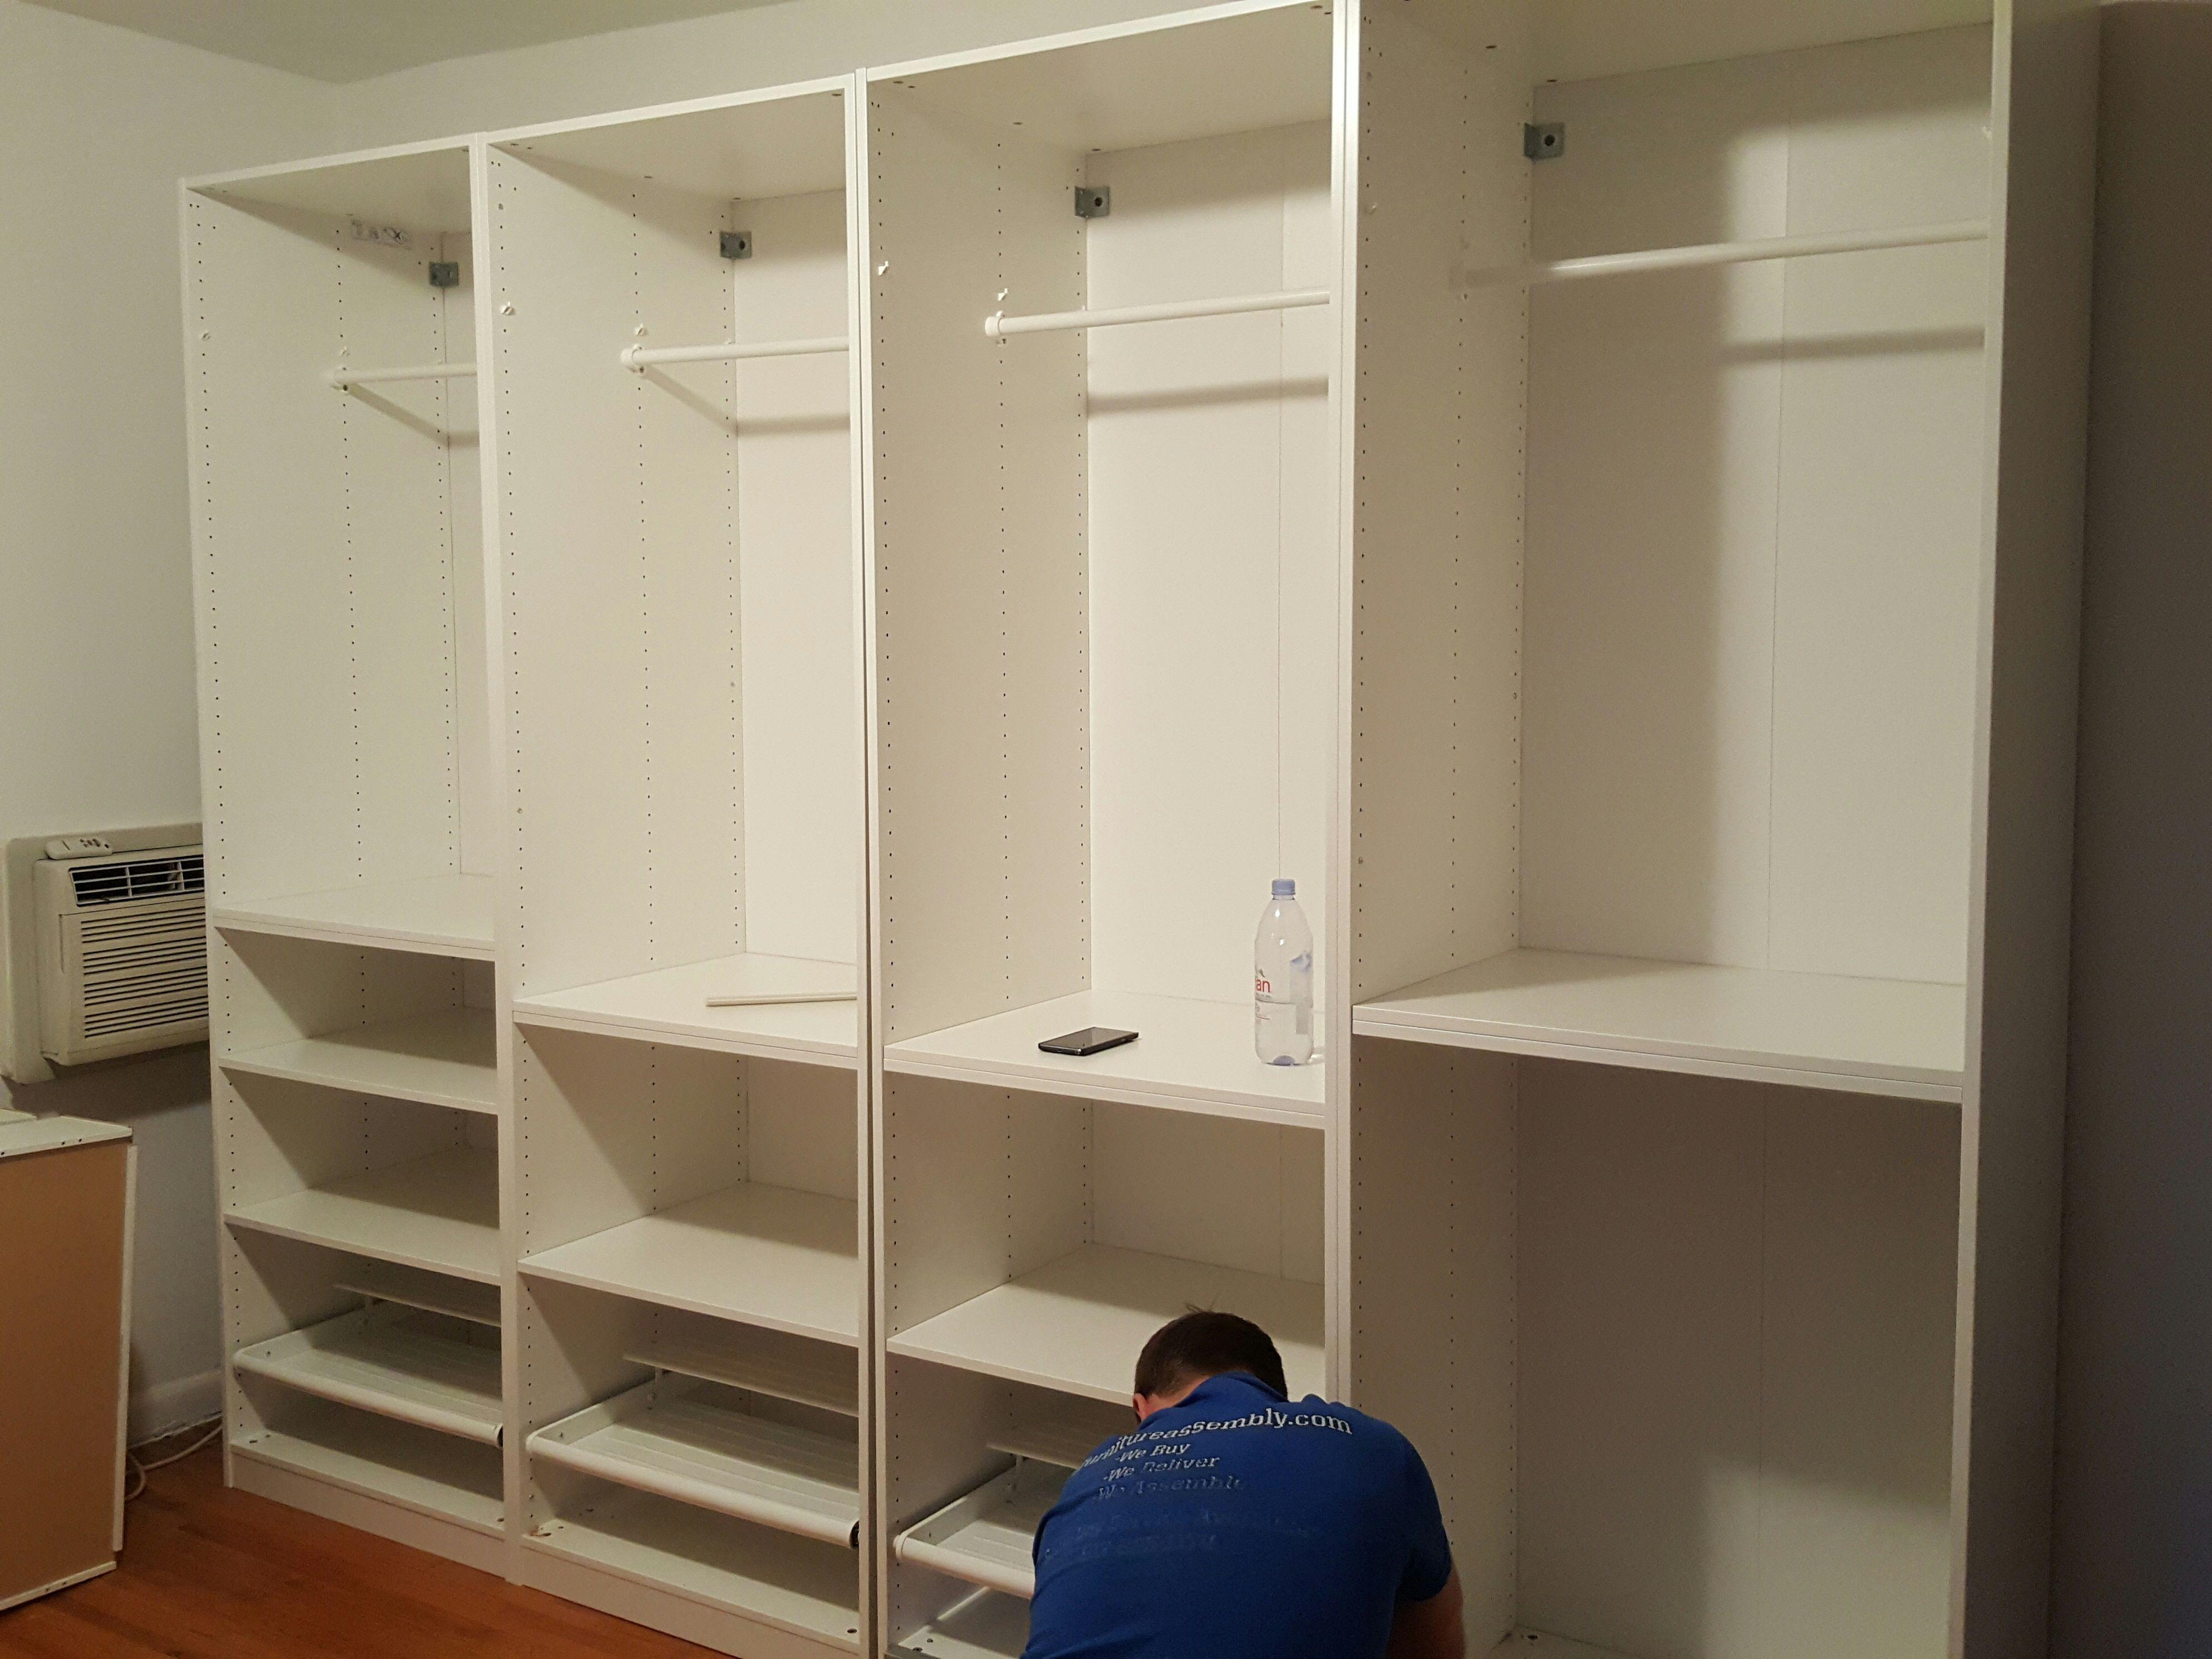 installation of ikea pax system ifurnitureassembly Furniture